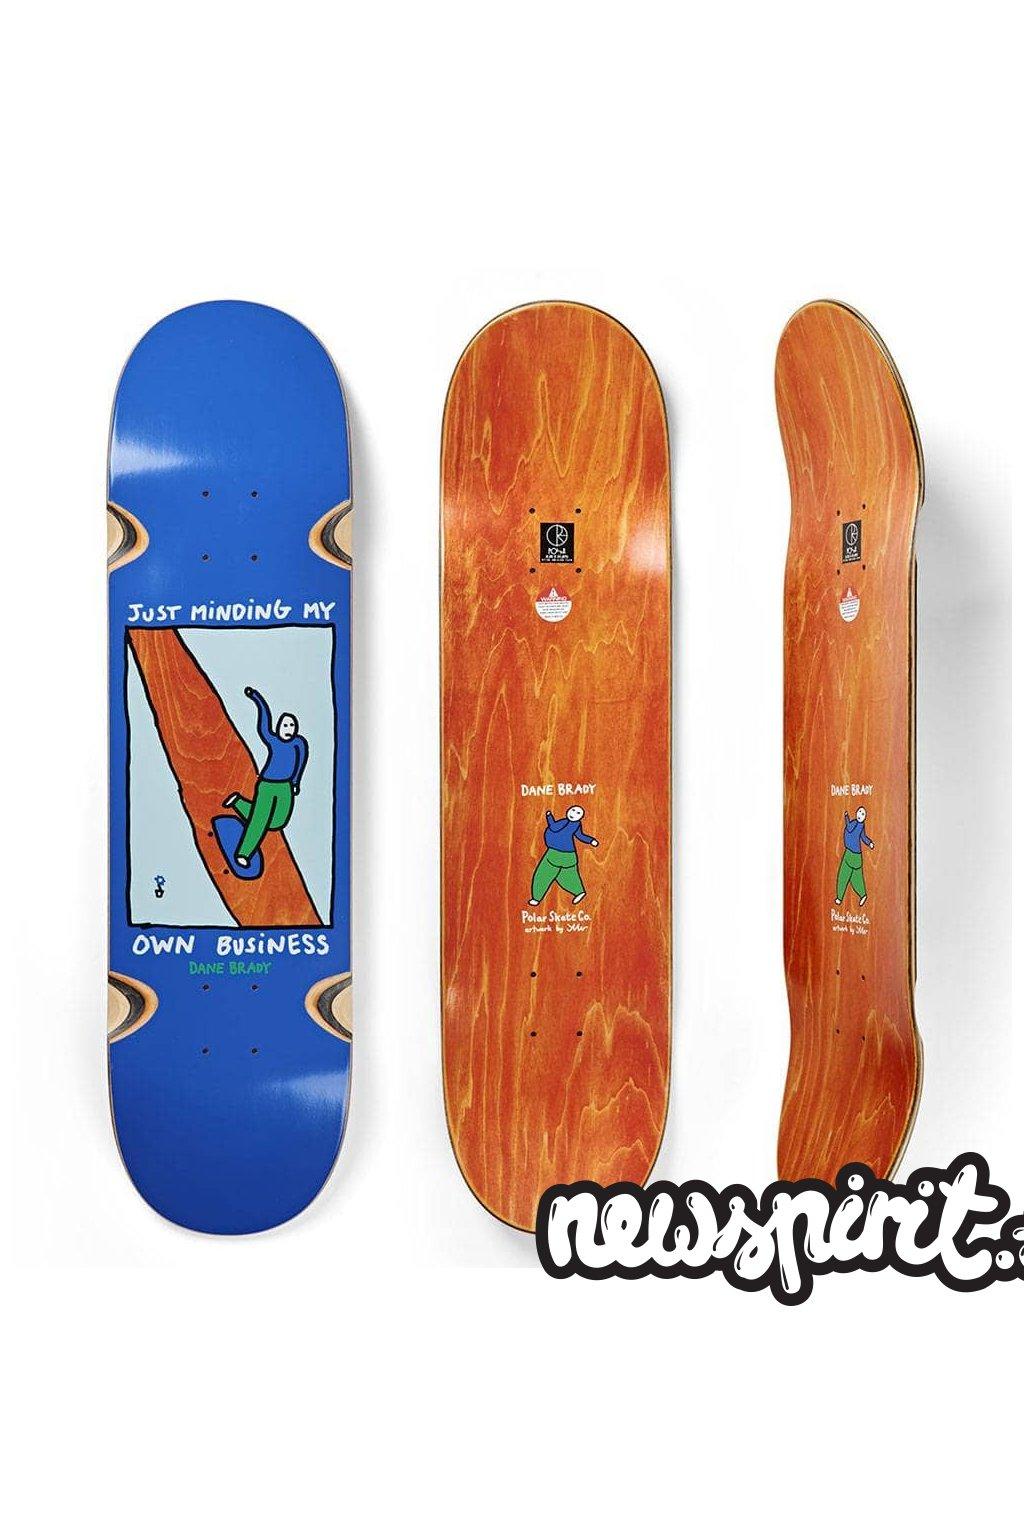 polar skateboards dane brady just minding my own business wheel whells skateboard deck 9 0